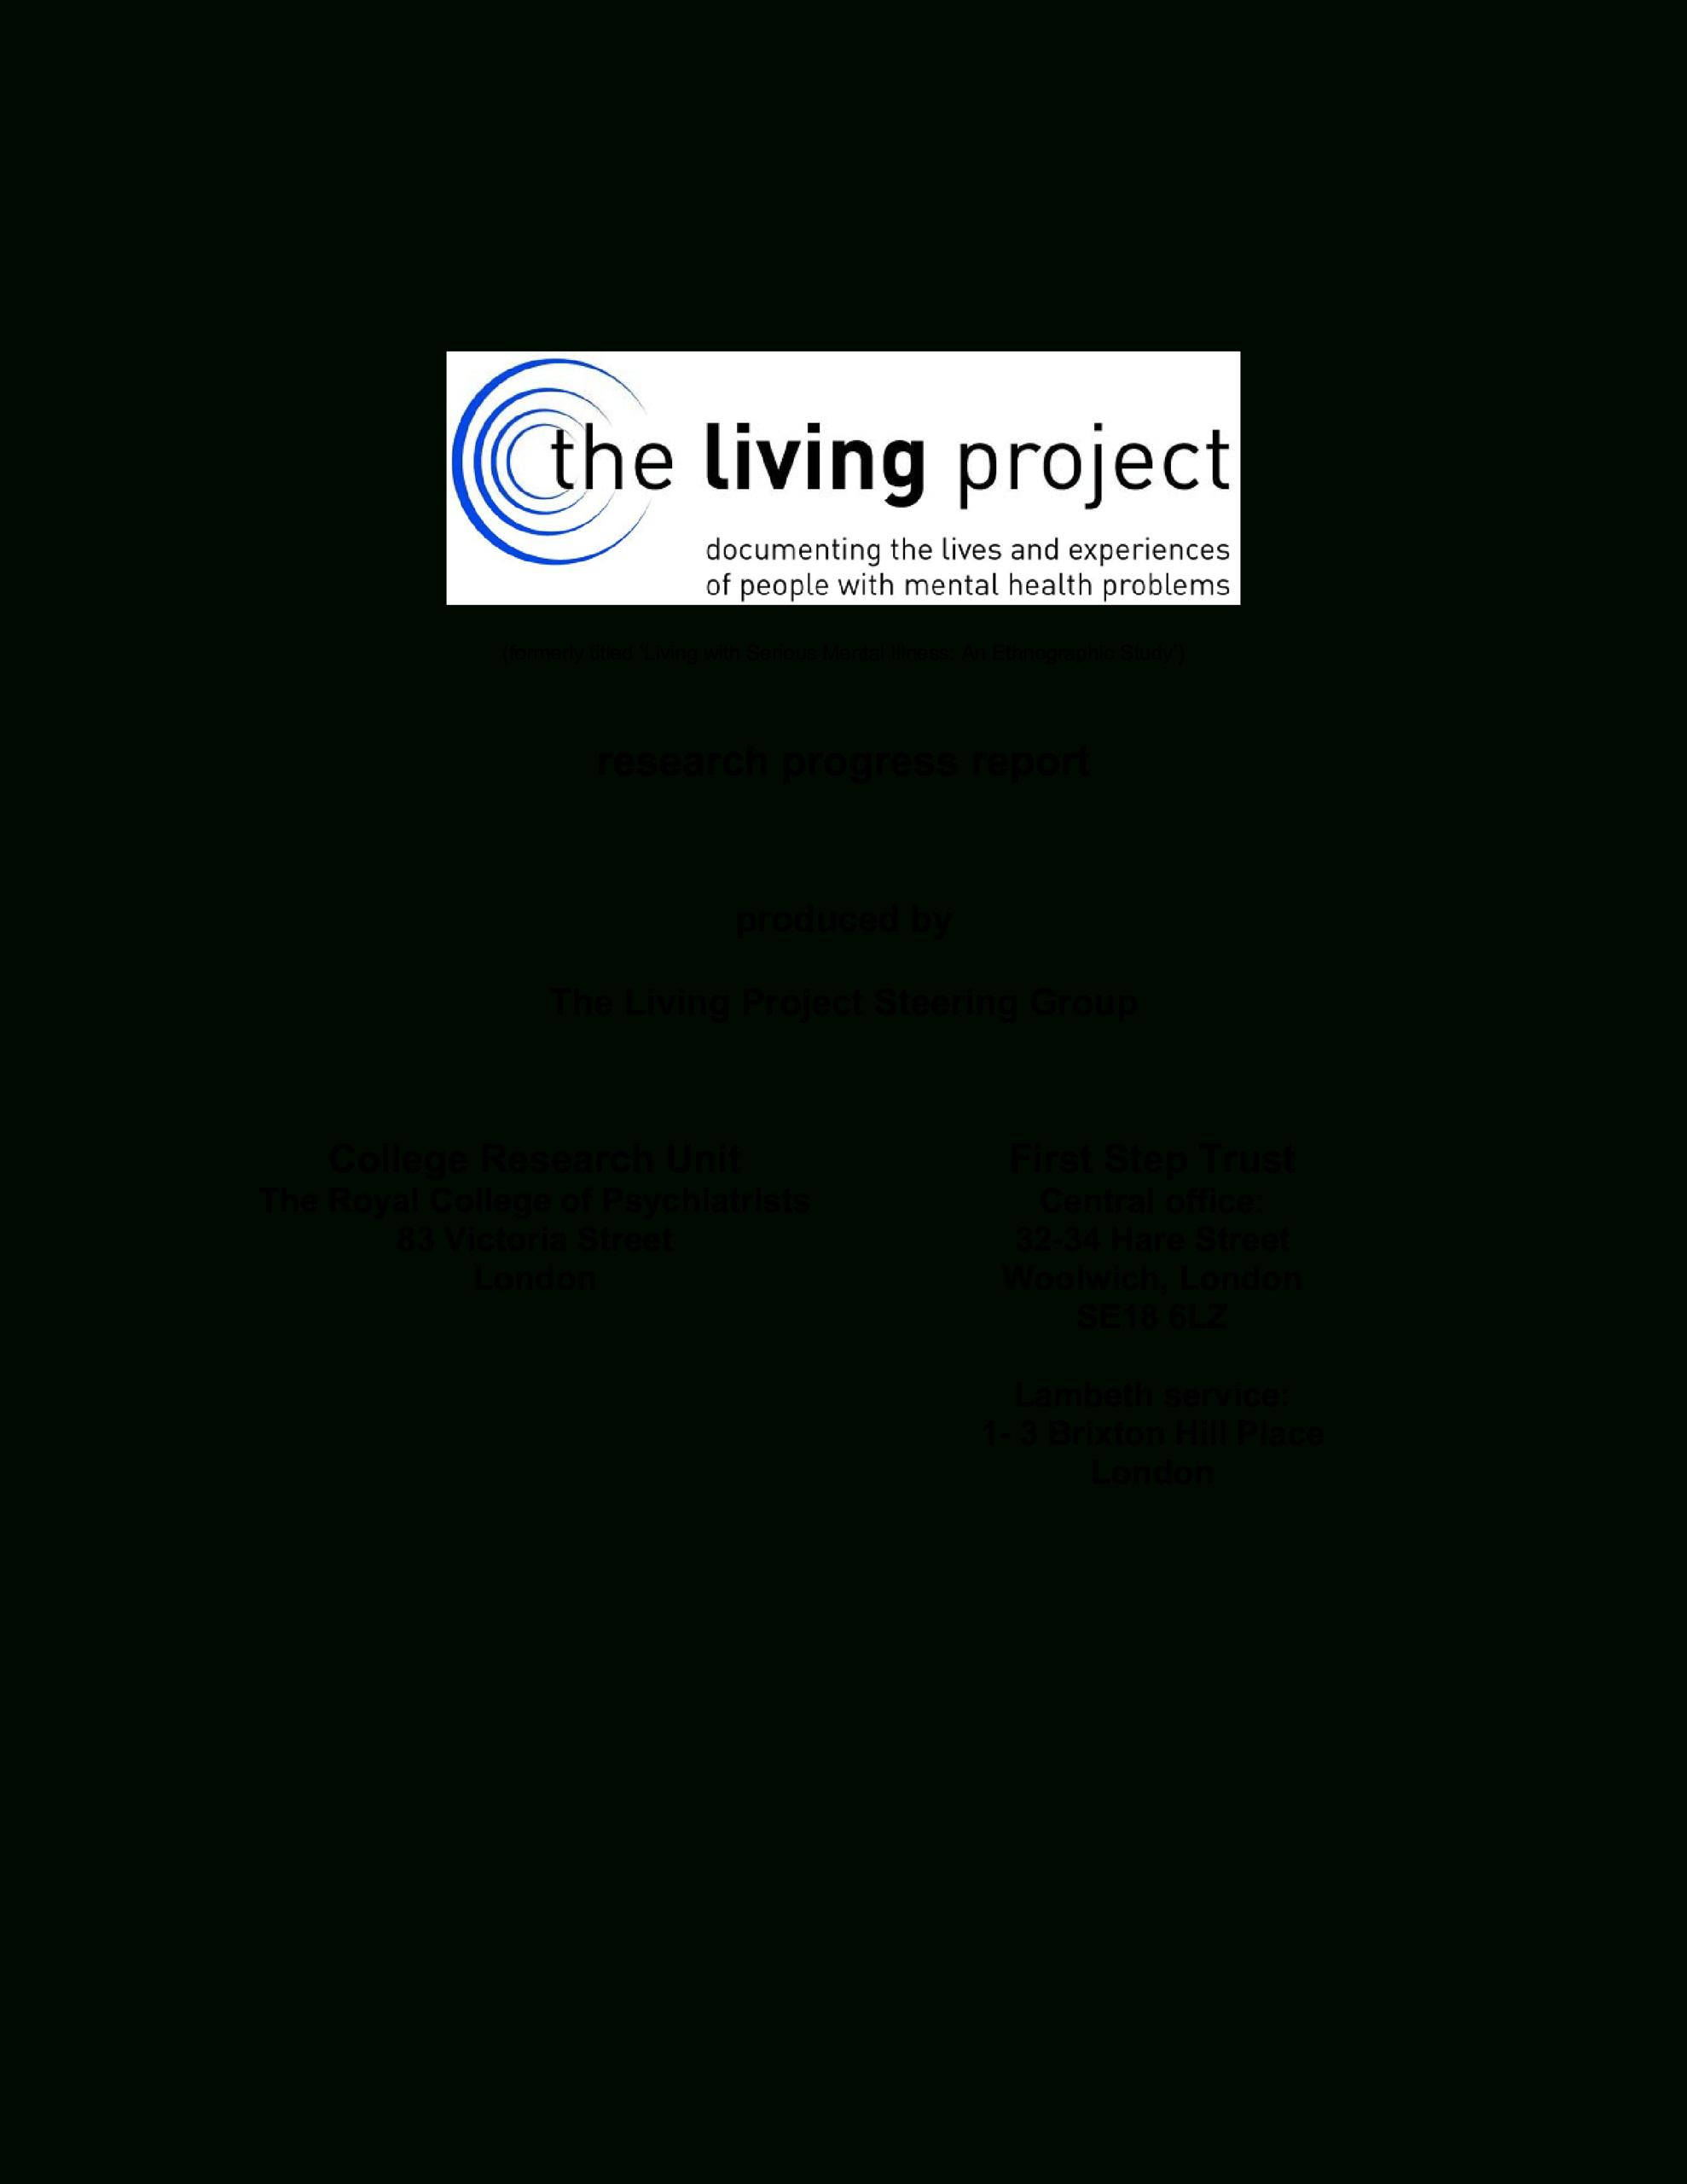 Research Progress Report Sample | Templates At Within Research Project Progress Report Template